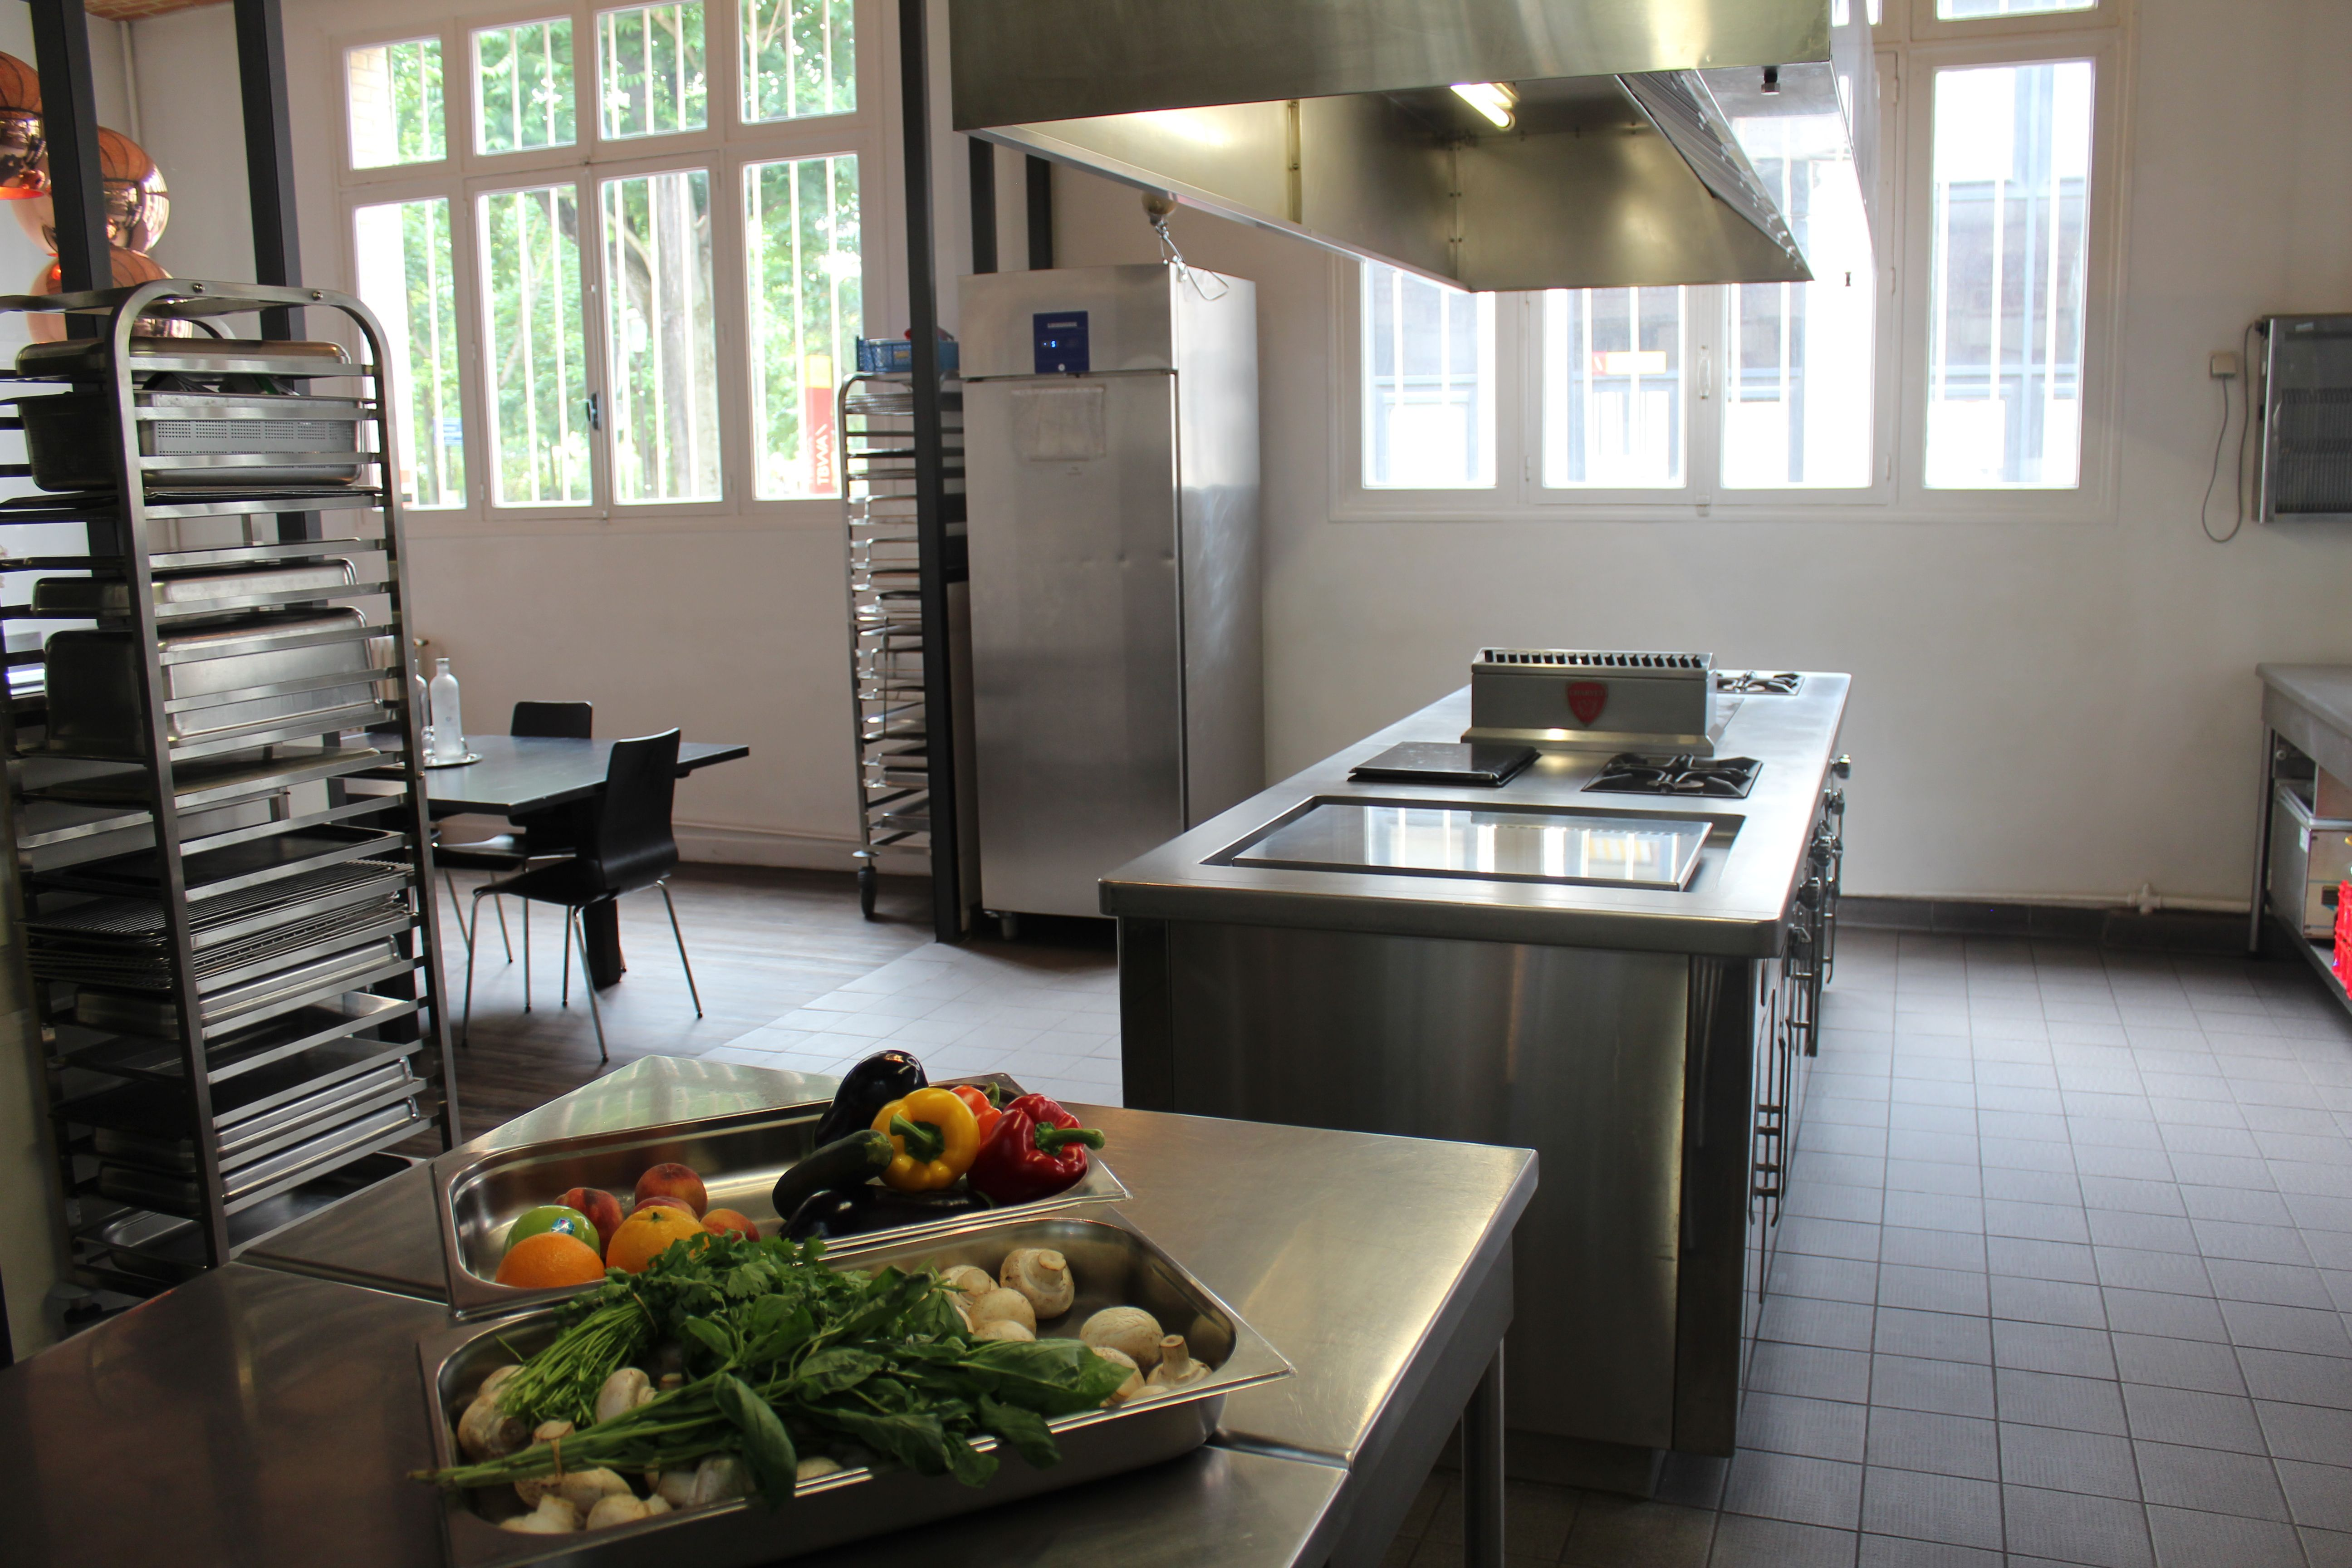 Espace Cuisine Professionnelle Cuisine Loft Cuisines Design Cuisine